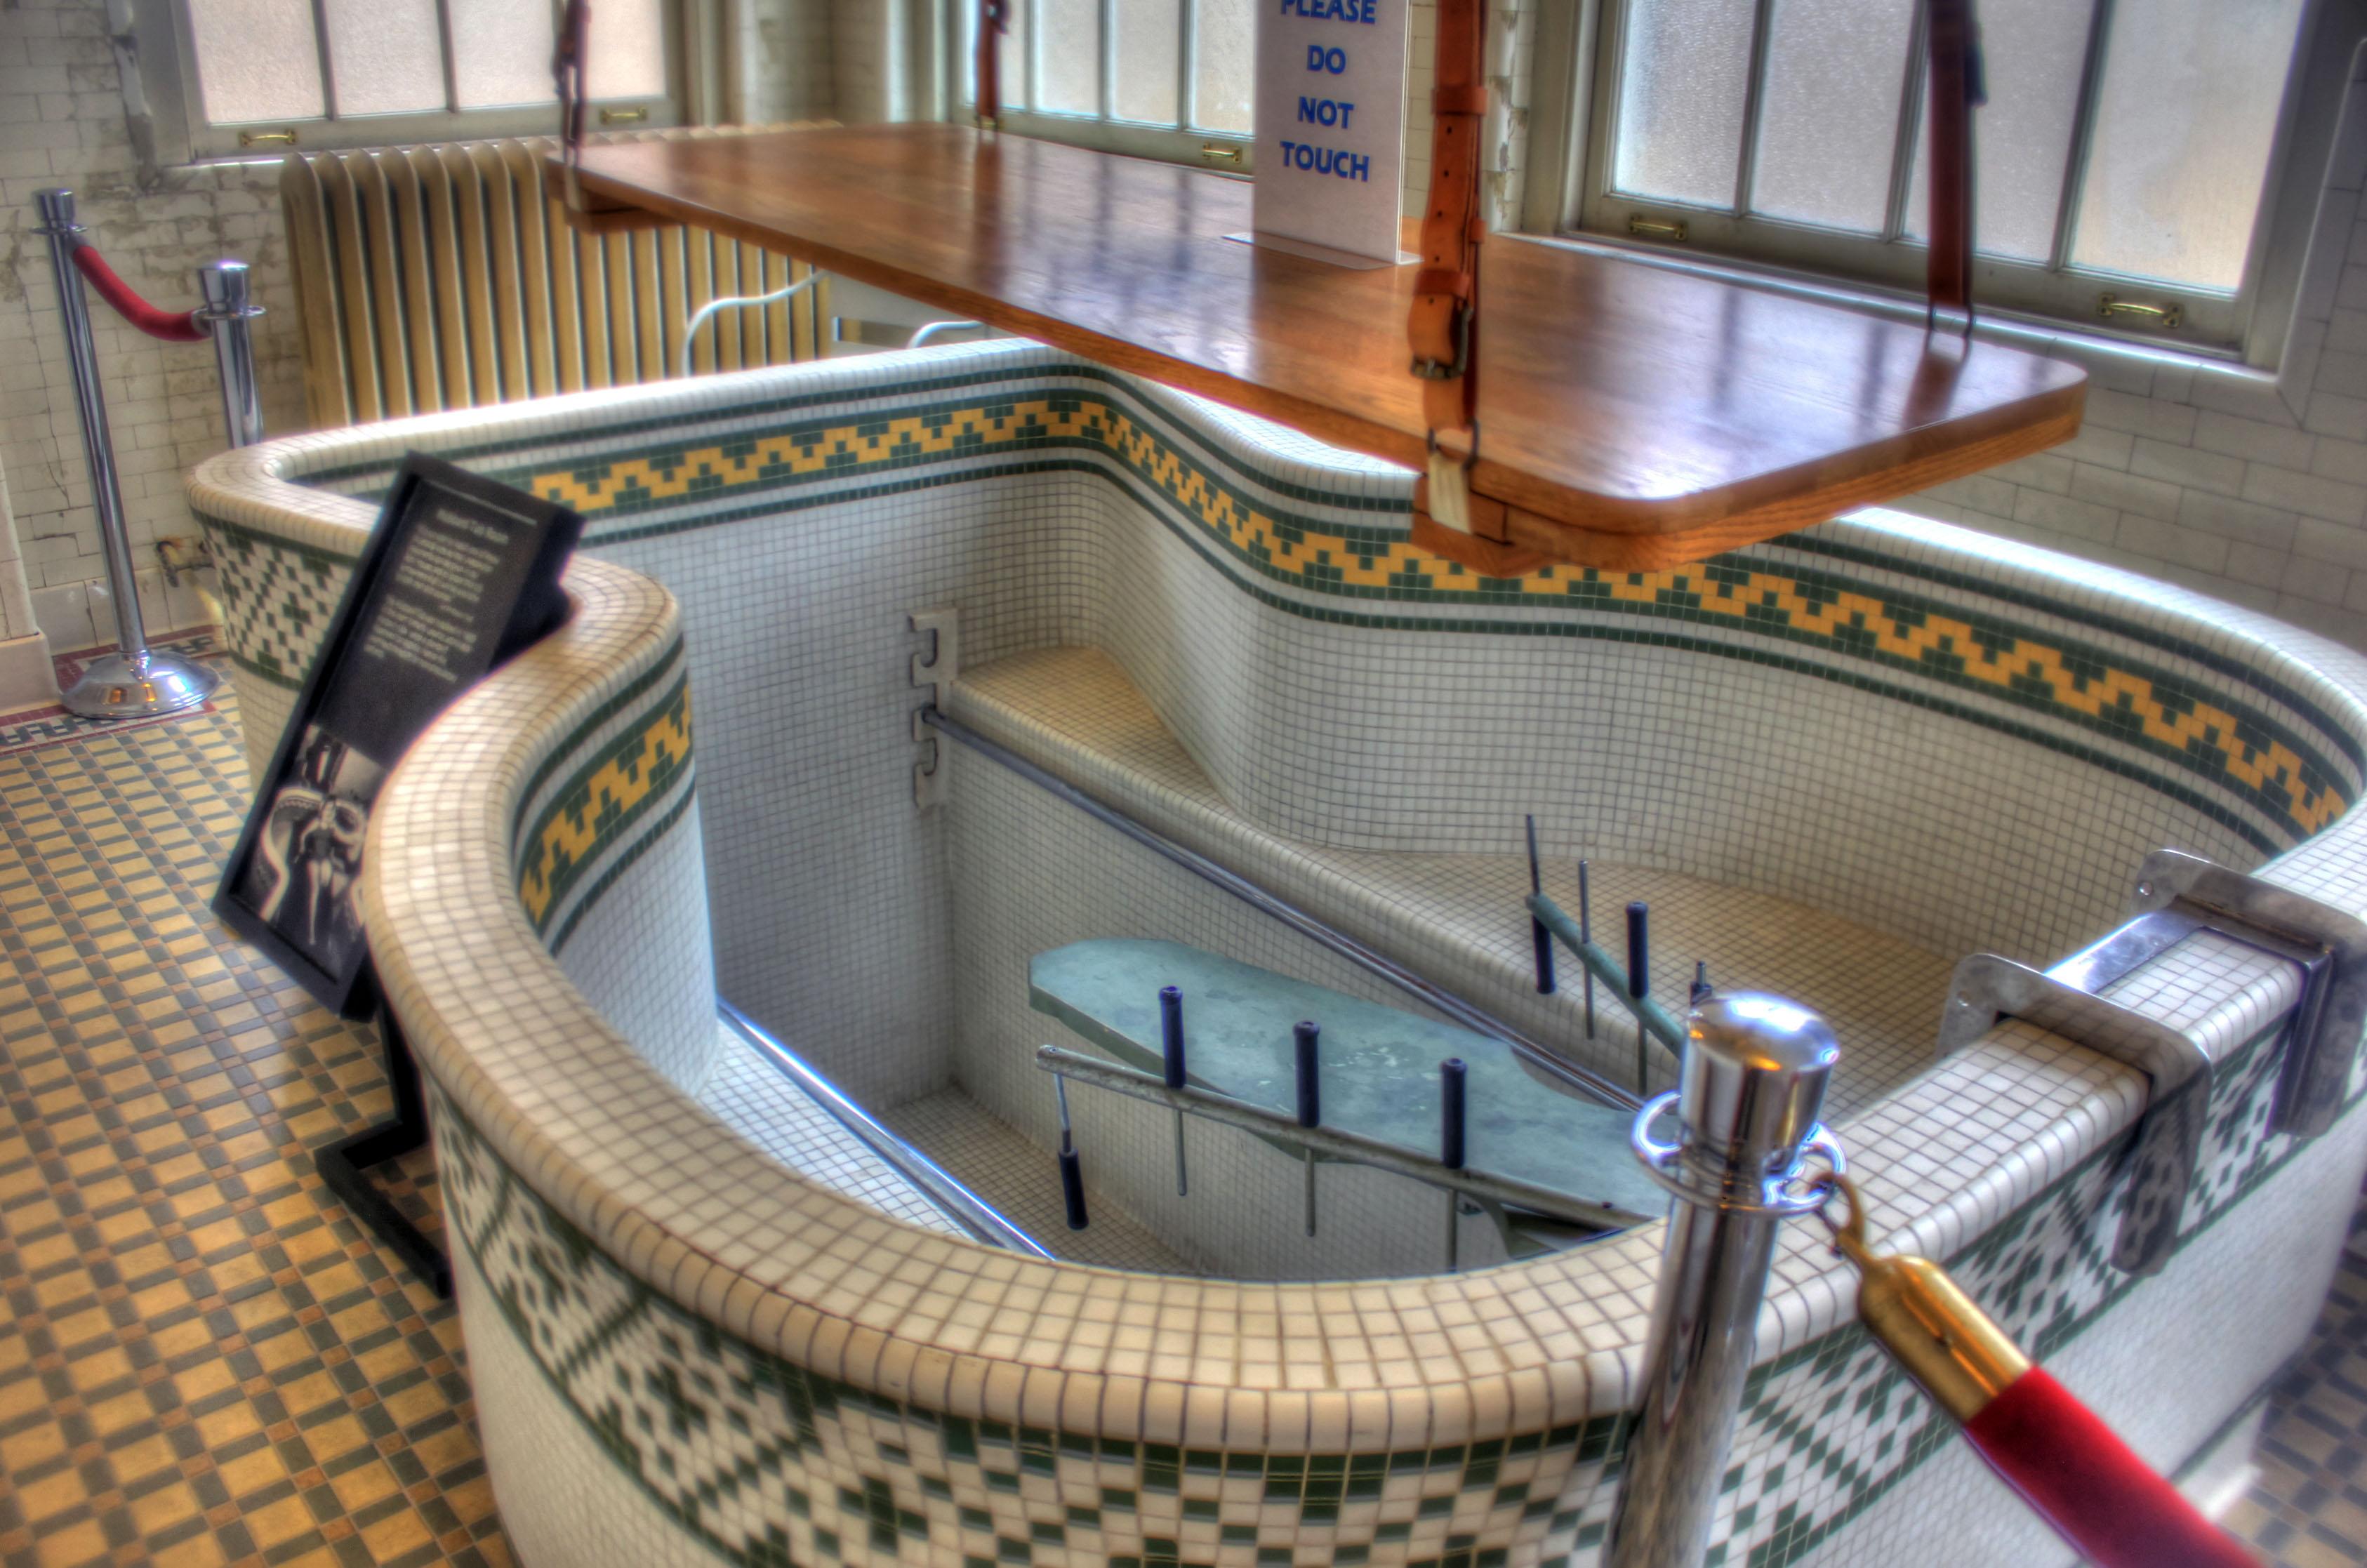 File:Gfp-arkansas-hot-springs-bathtub-of-bathhouse.jpg - Wikimedia ...